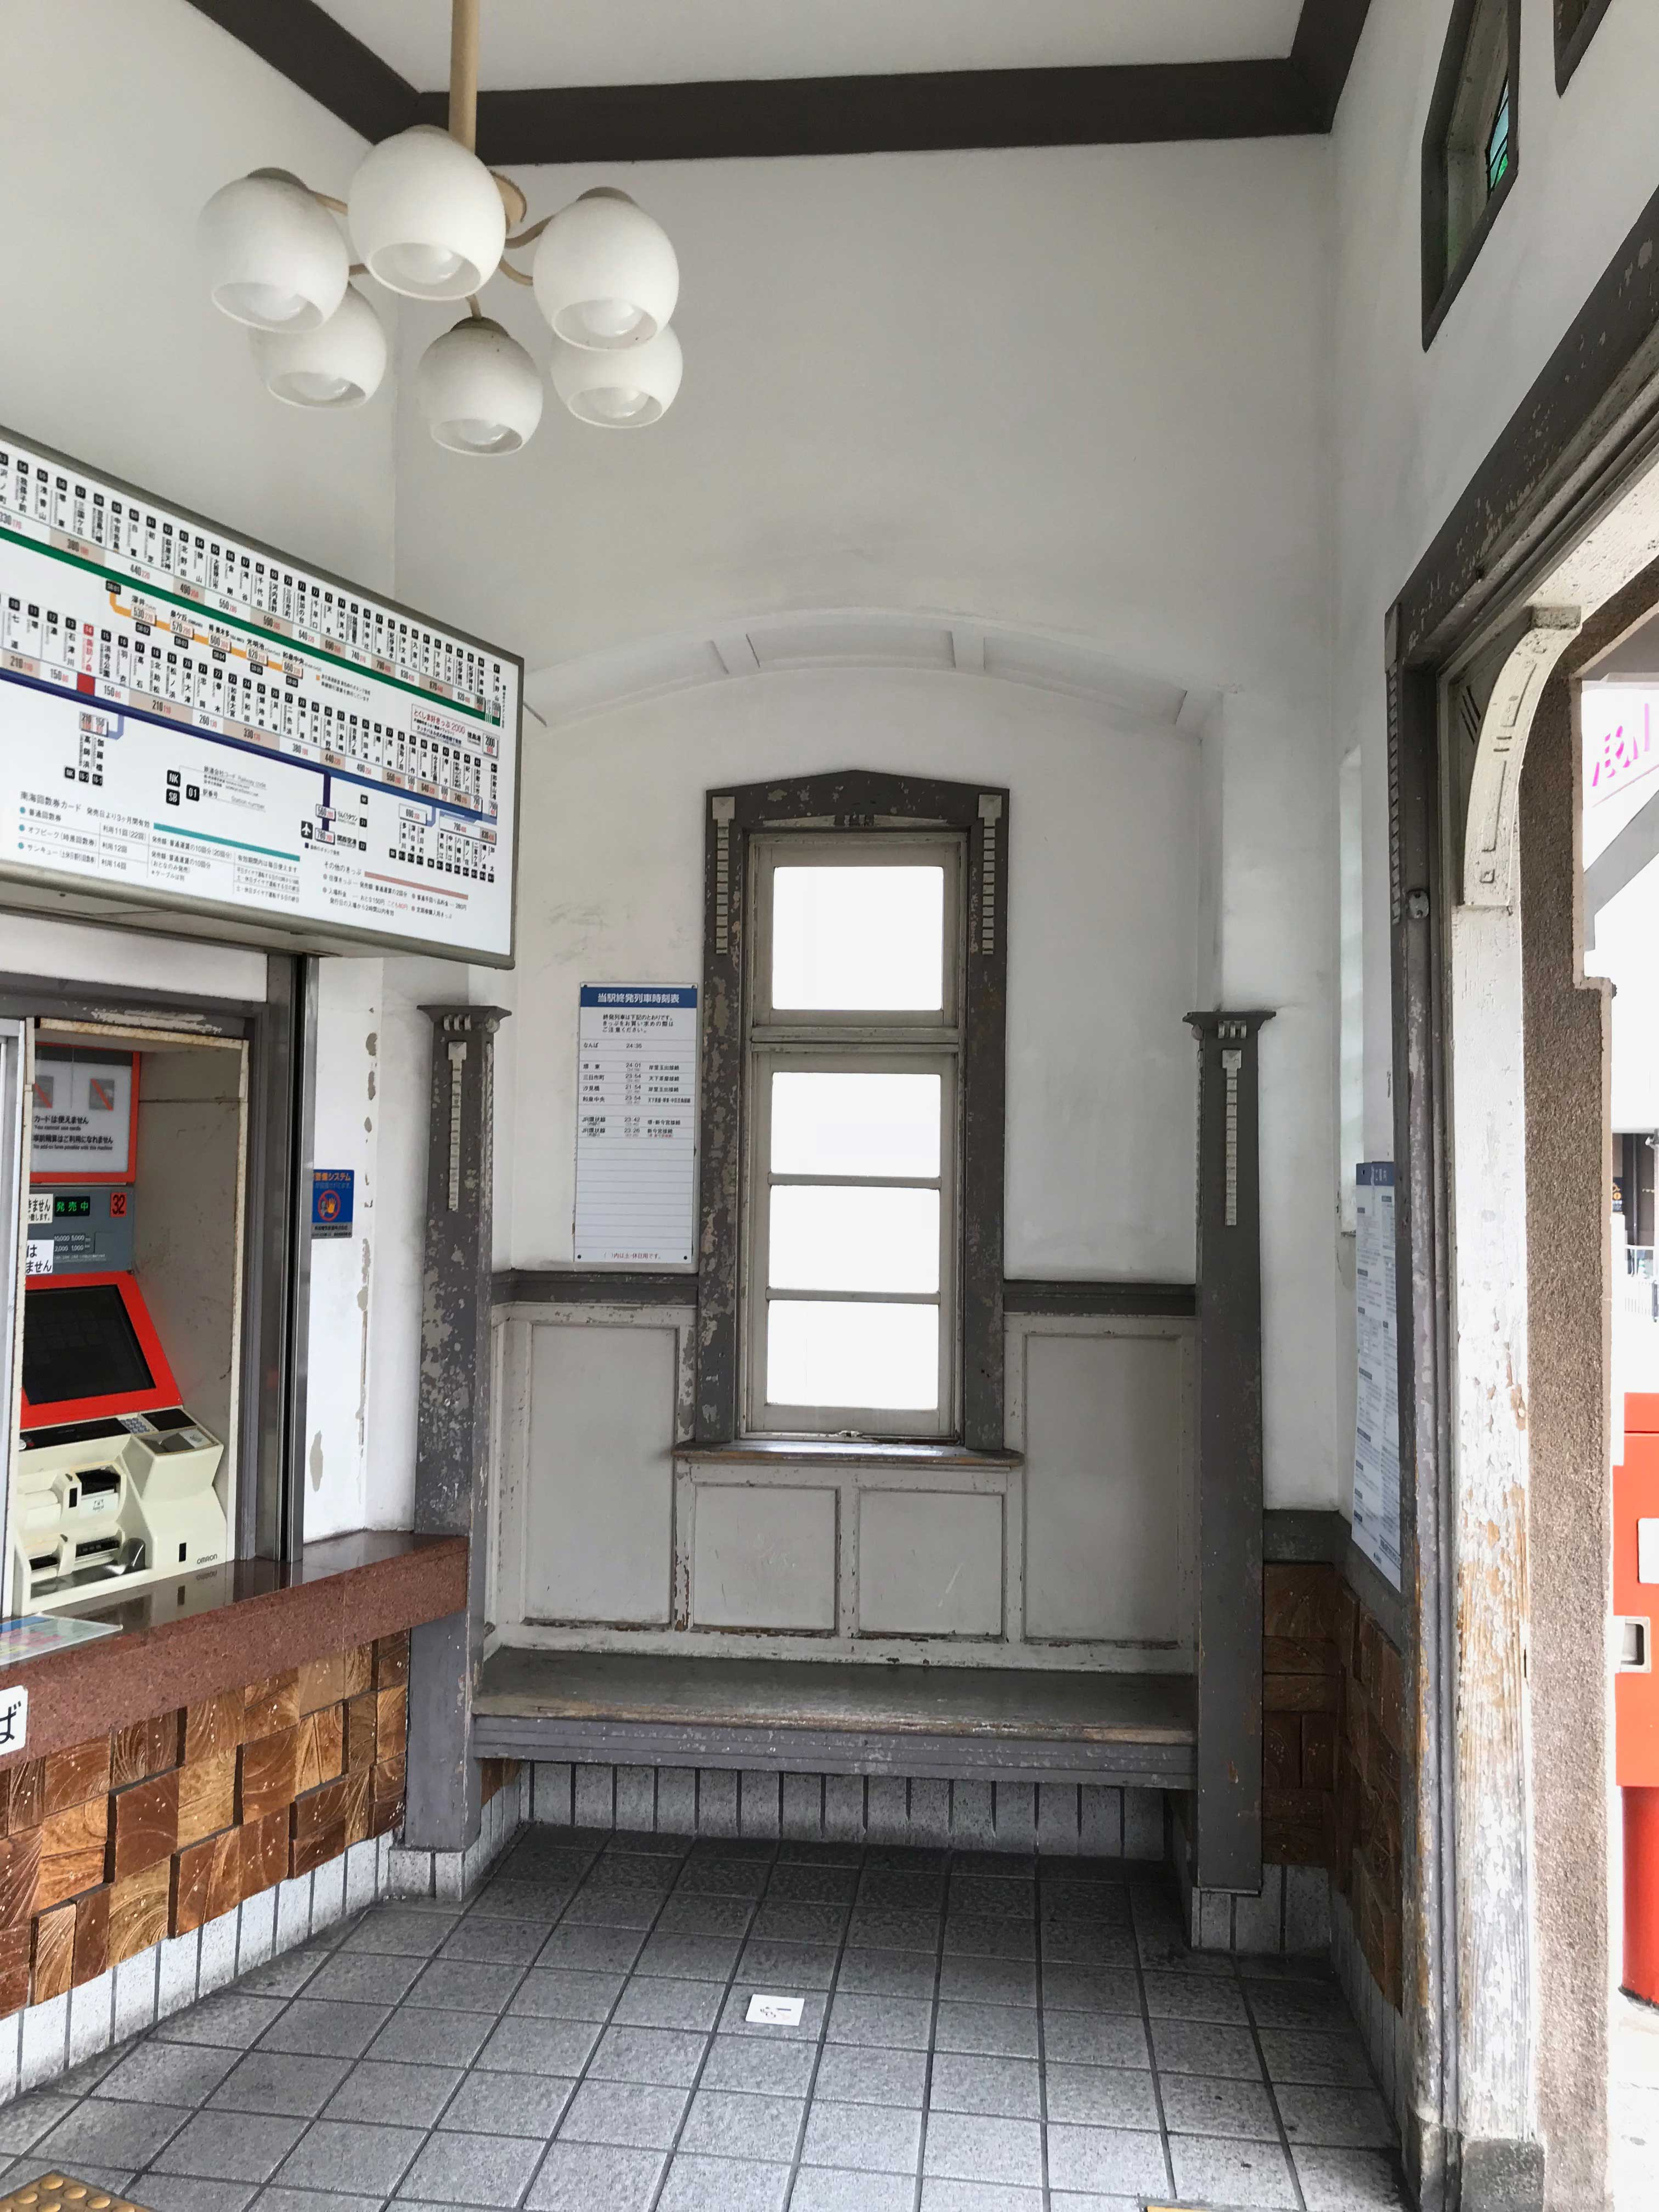 <p>諏訪ノ森駅駅舎-待ち合い空間</p>